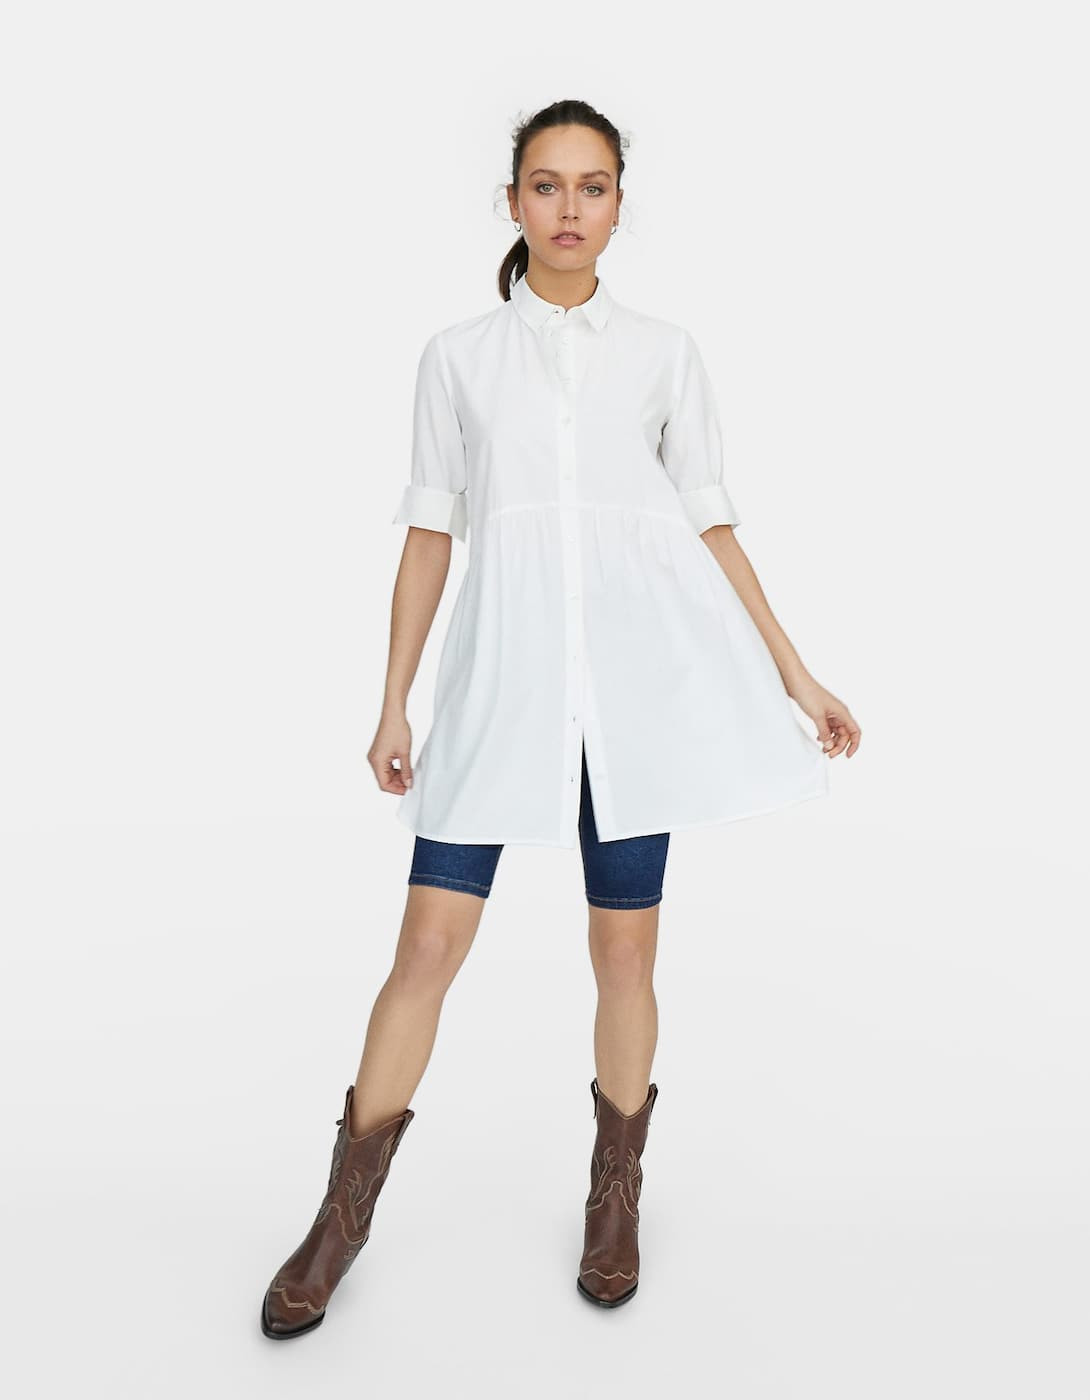 Camisa vestido de popelina 12,99 euros (19,99 euros).jpg